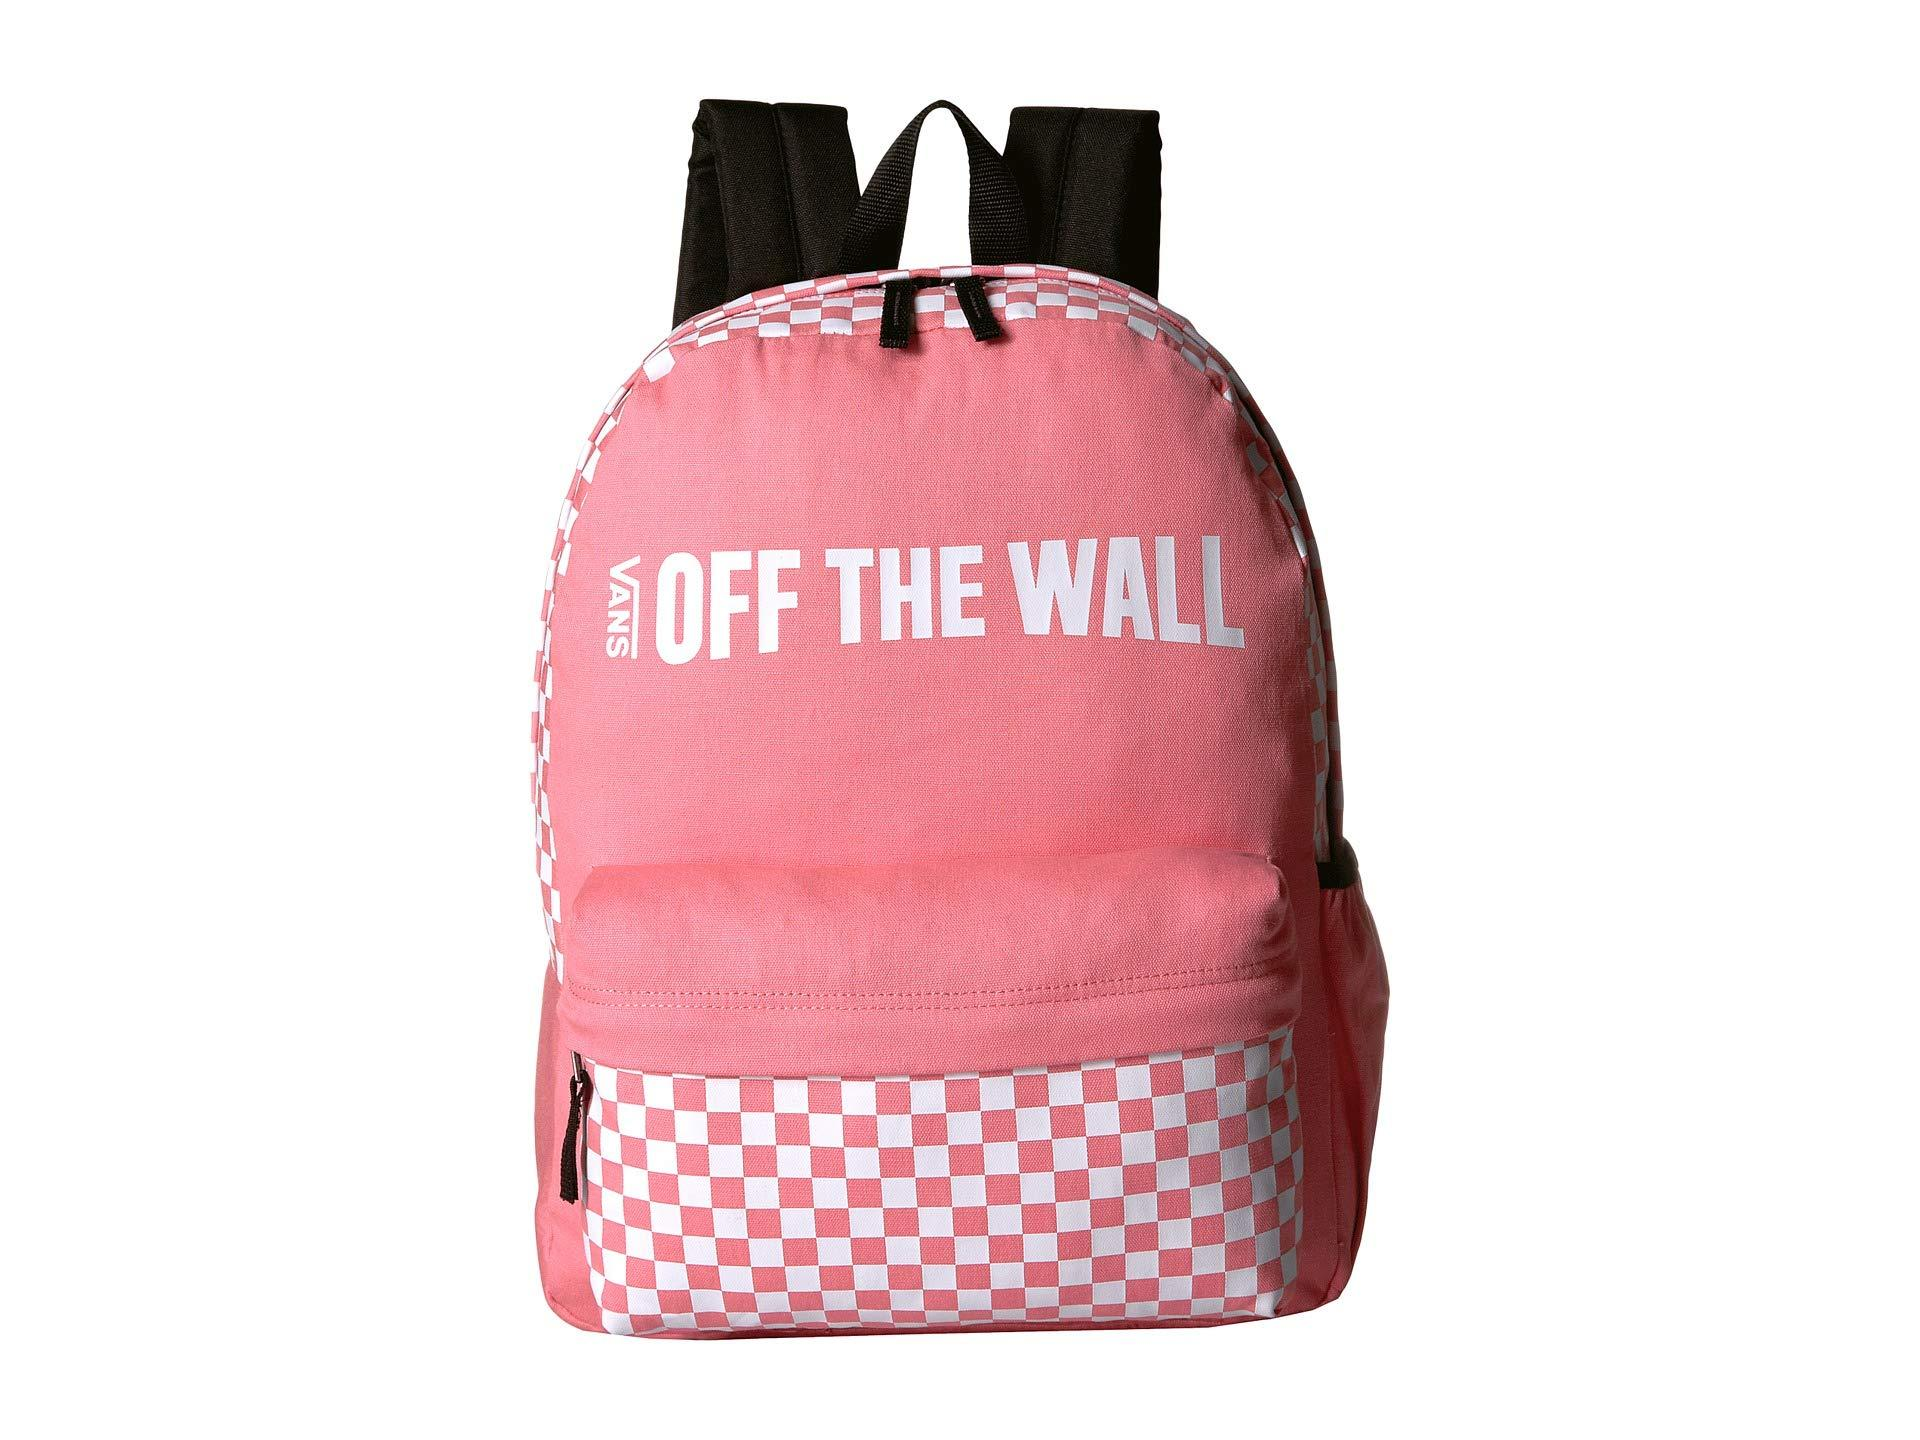 9c5f4784050 Lyst - Vans Central Realm Backpack (black) Backpack Bags in Pink